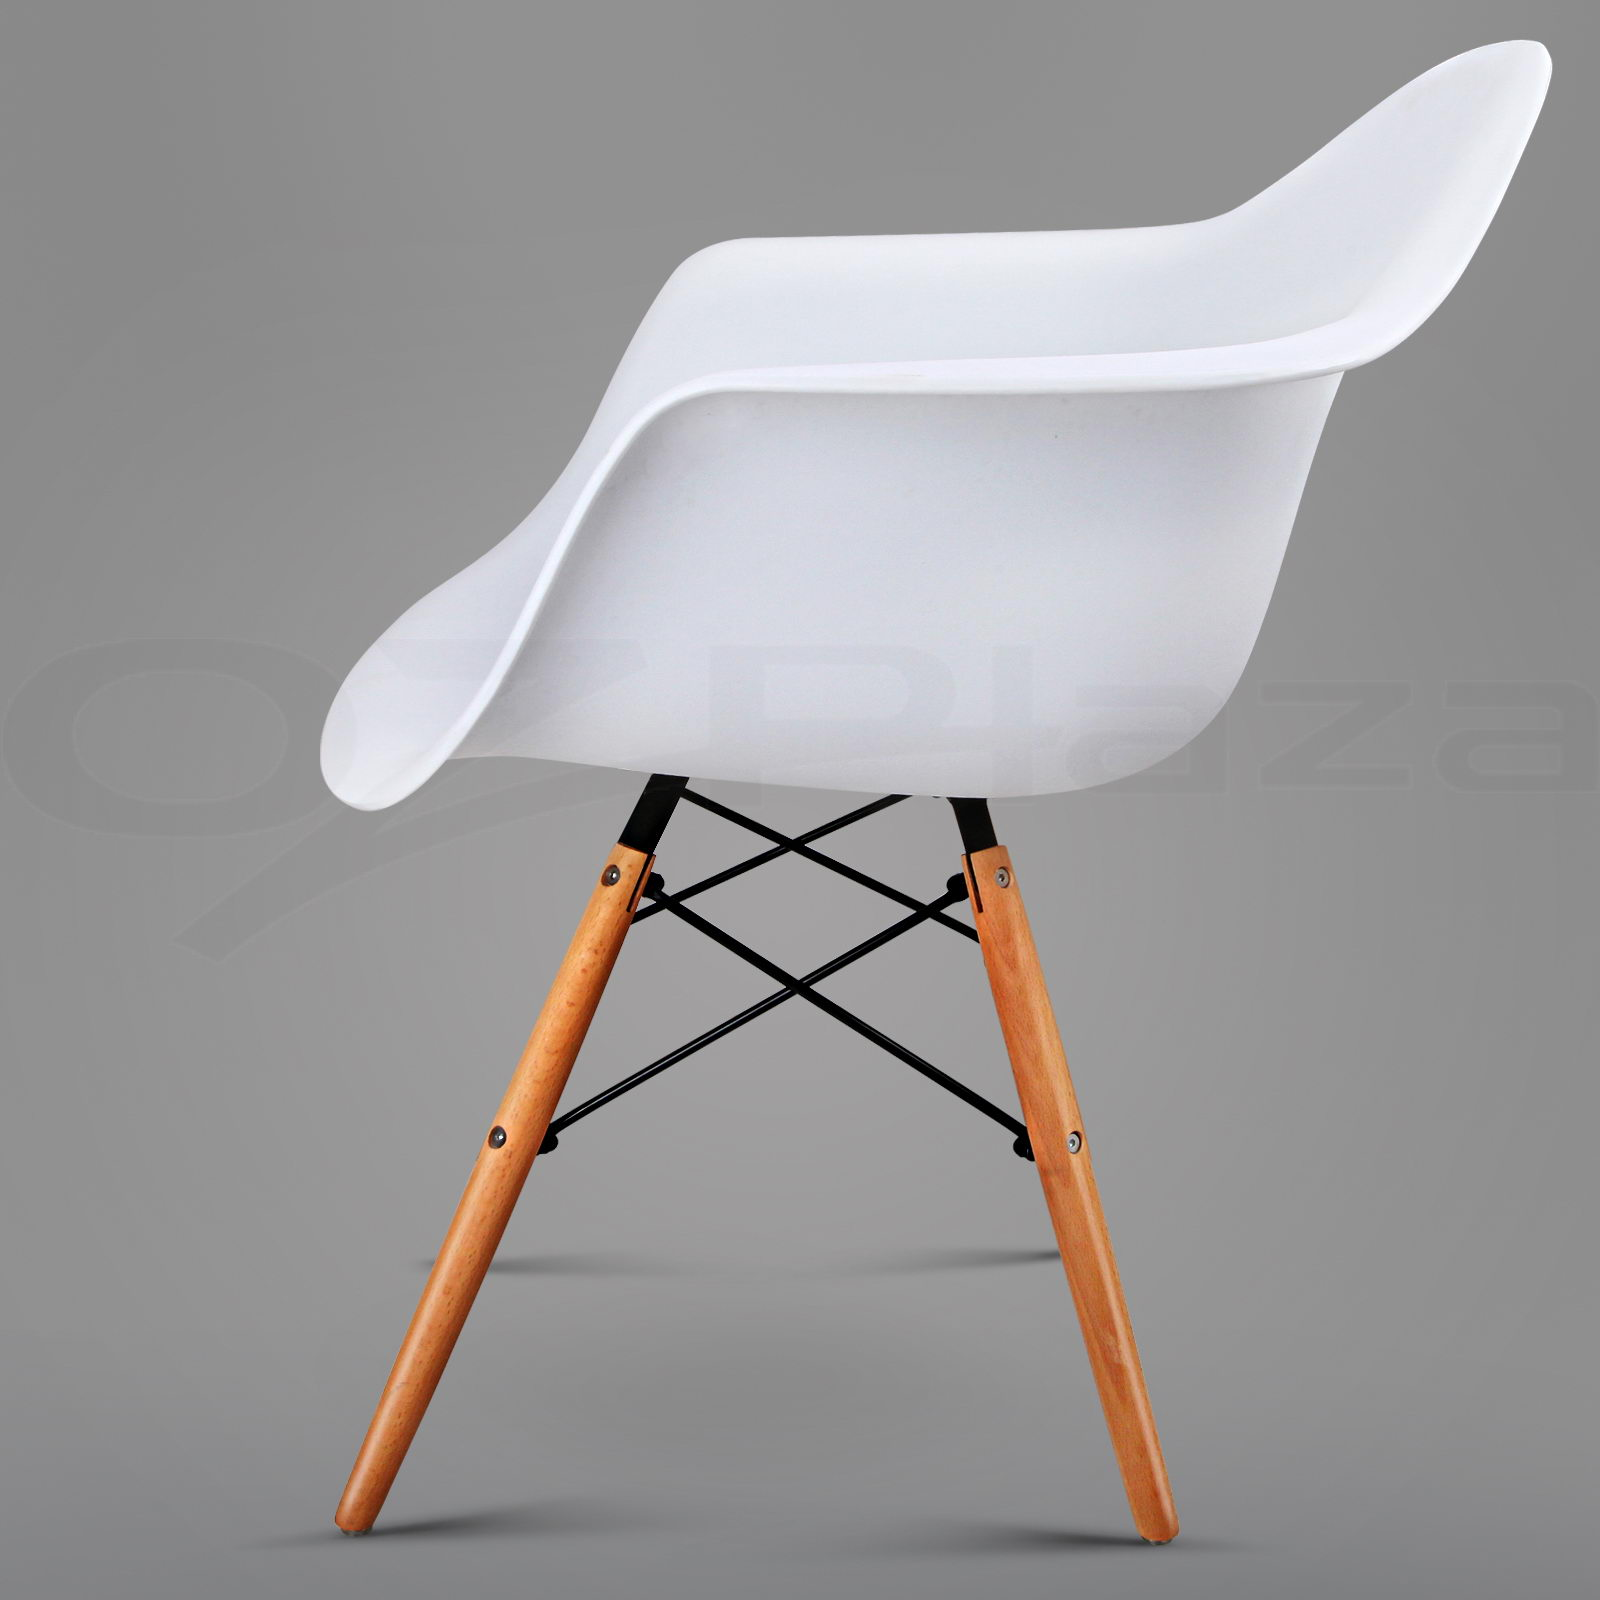 2 x retro replica eames dsw dining chair daw armchair for Eames chair daw replica